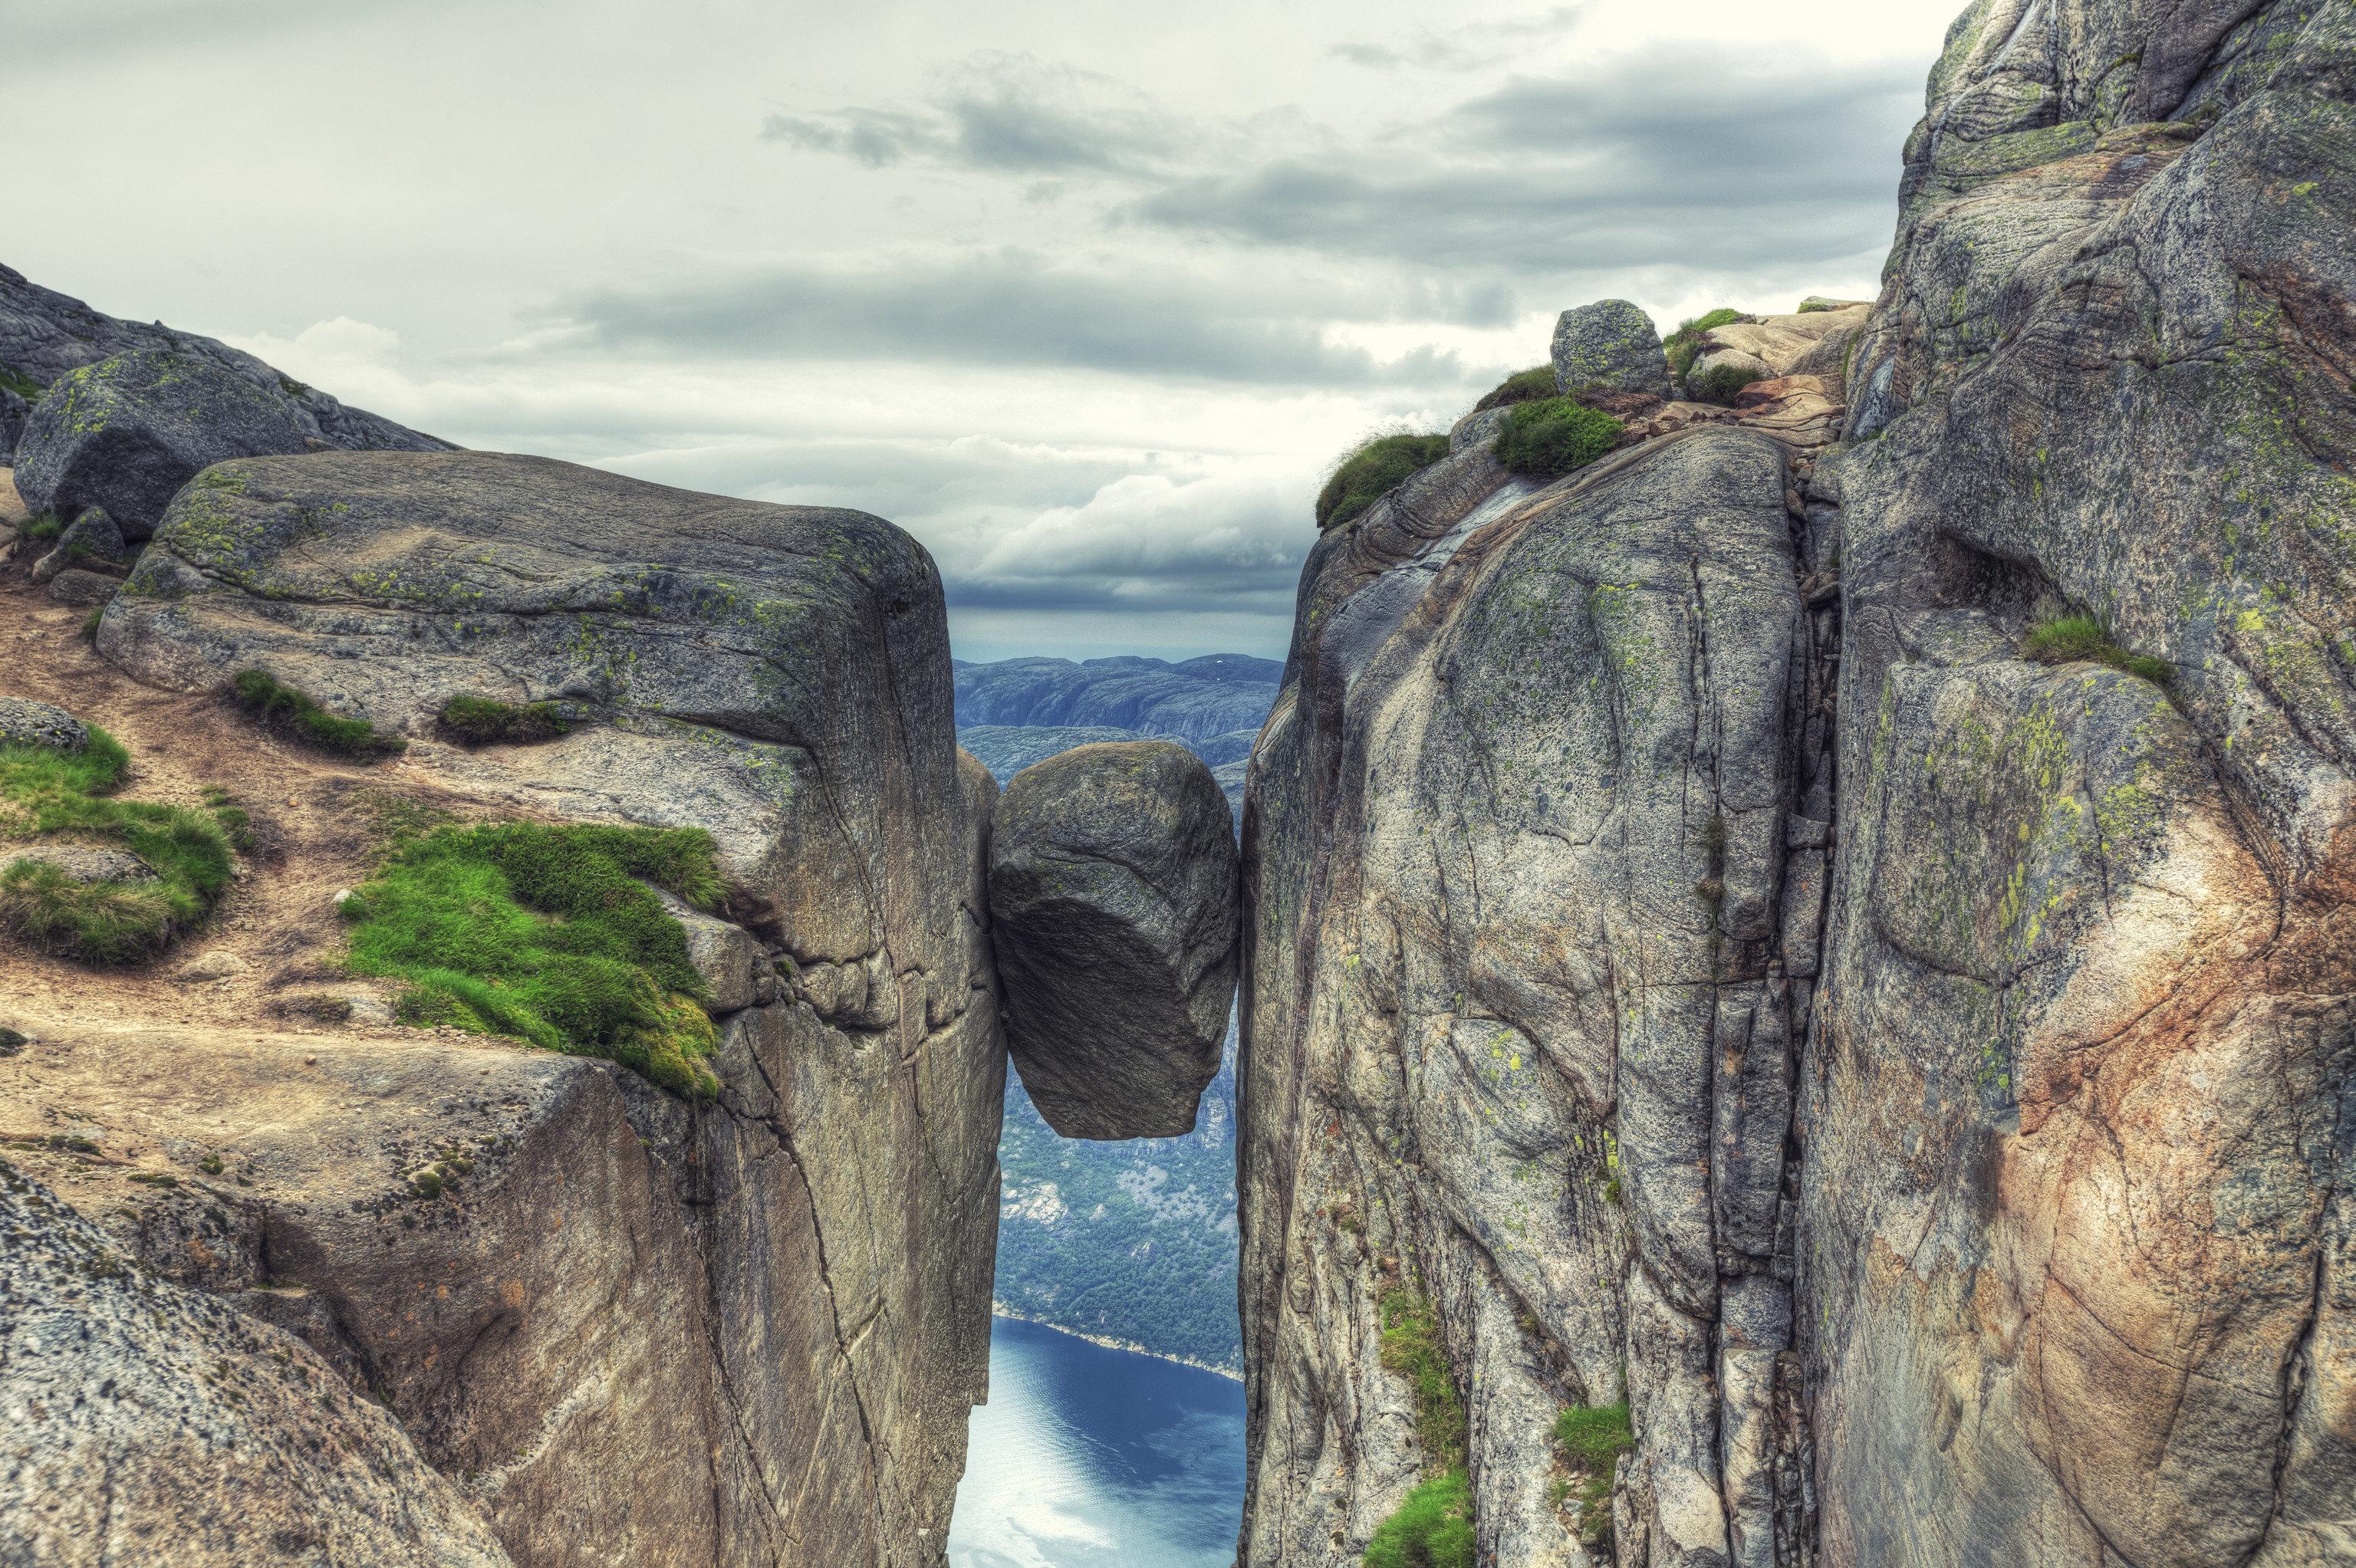 Norway Oslo Trip Ideas rock water cliff sky terrain boulder tree formation outcrop escarpment geology mountain landscape national park bedrock grass klippe tourism